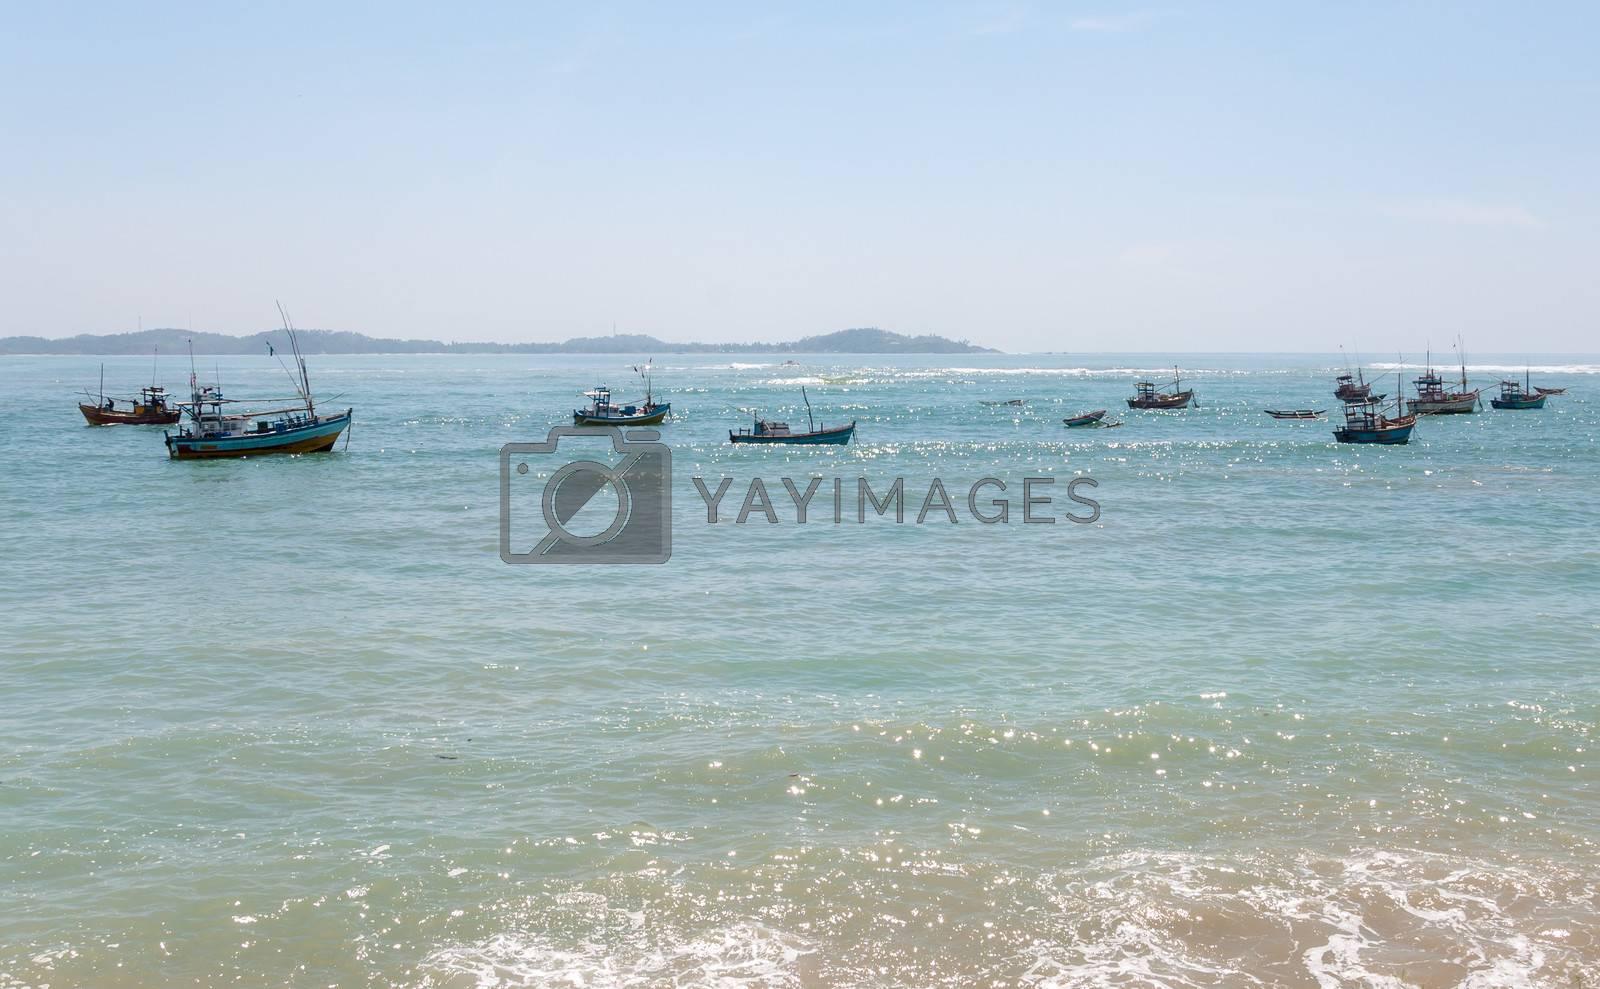 Fishboats on Indian Ocean, southern coast of Sri Lanka.